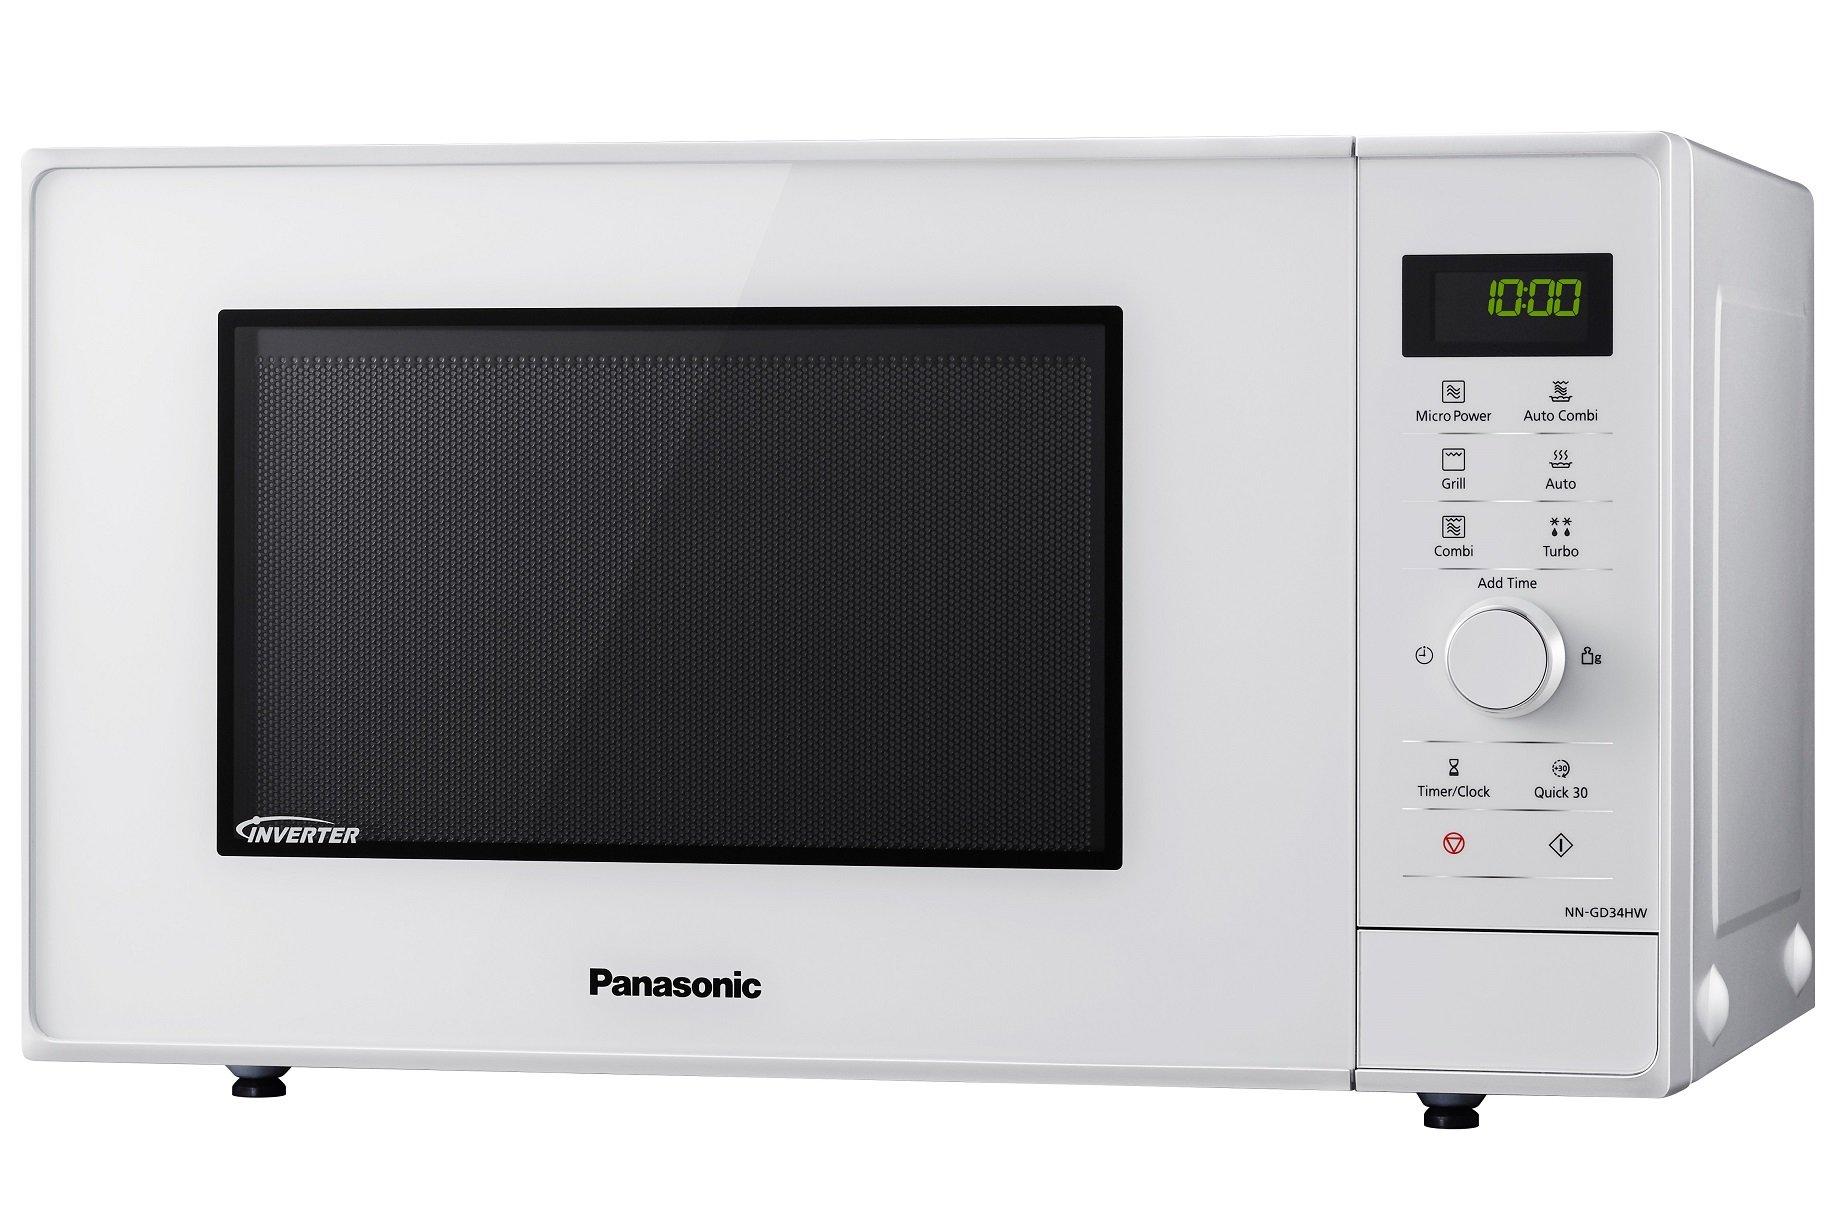 Panasonic NN-GD34HWSUG Horno microondas Compacto Inverter, 1000 W, 23 litros, Gris, Blanco